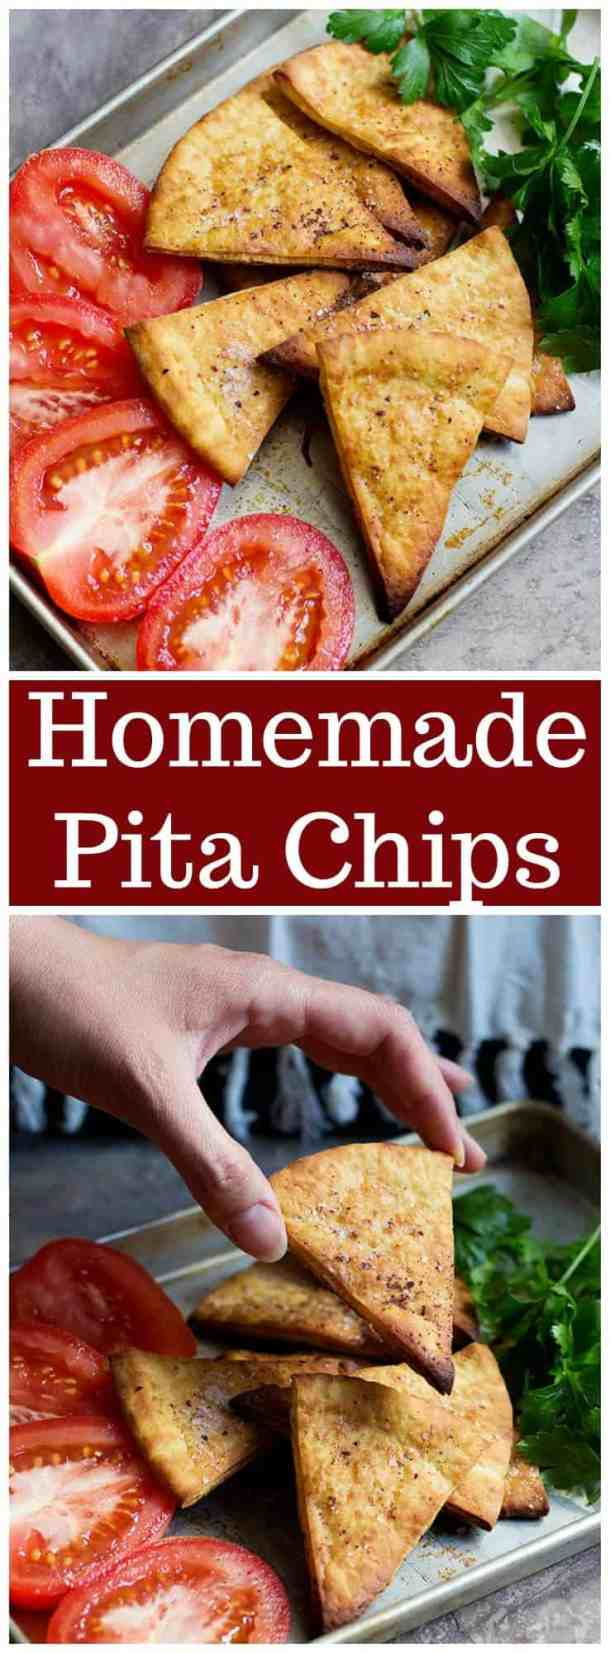 Pita Chips | Pita Chips Recipe | How to make pita chips |  Baked Pita chips | Healthy Snacks | Easy Snacks | Hummus and pita chips | Mediterranean Recipes | Homemade Pita Chips | UnicornsintheKitchen.com